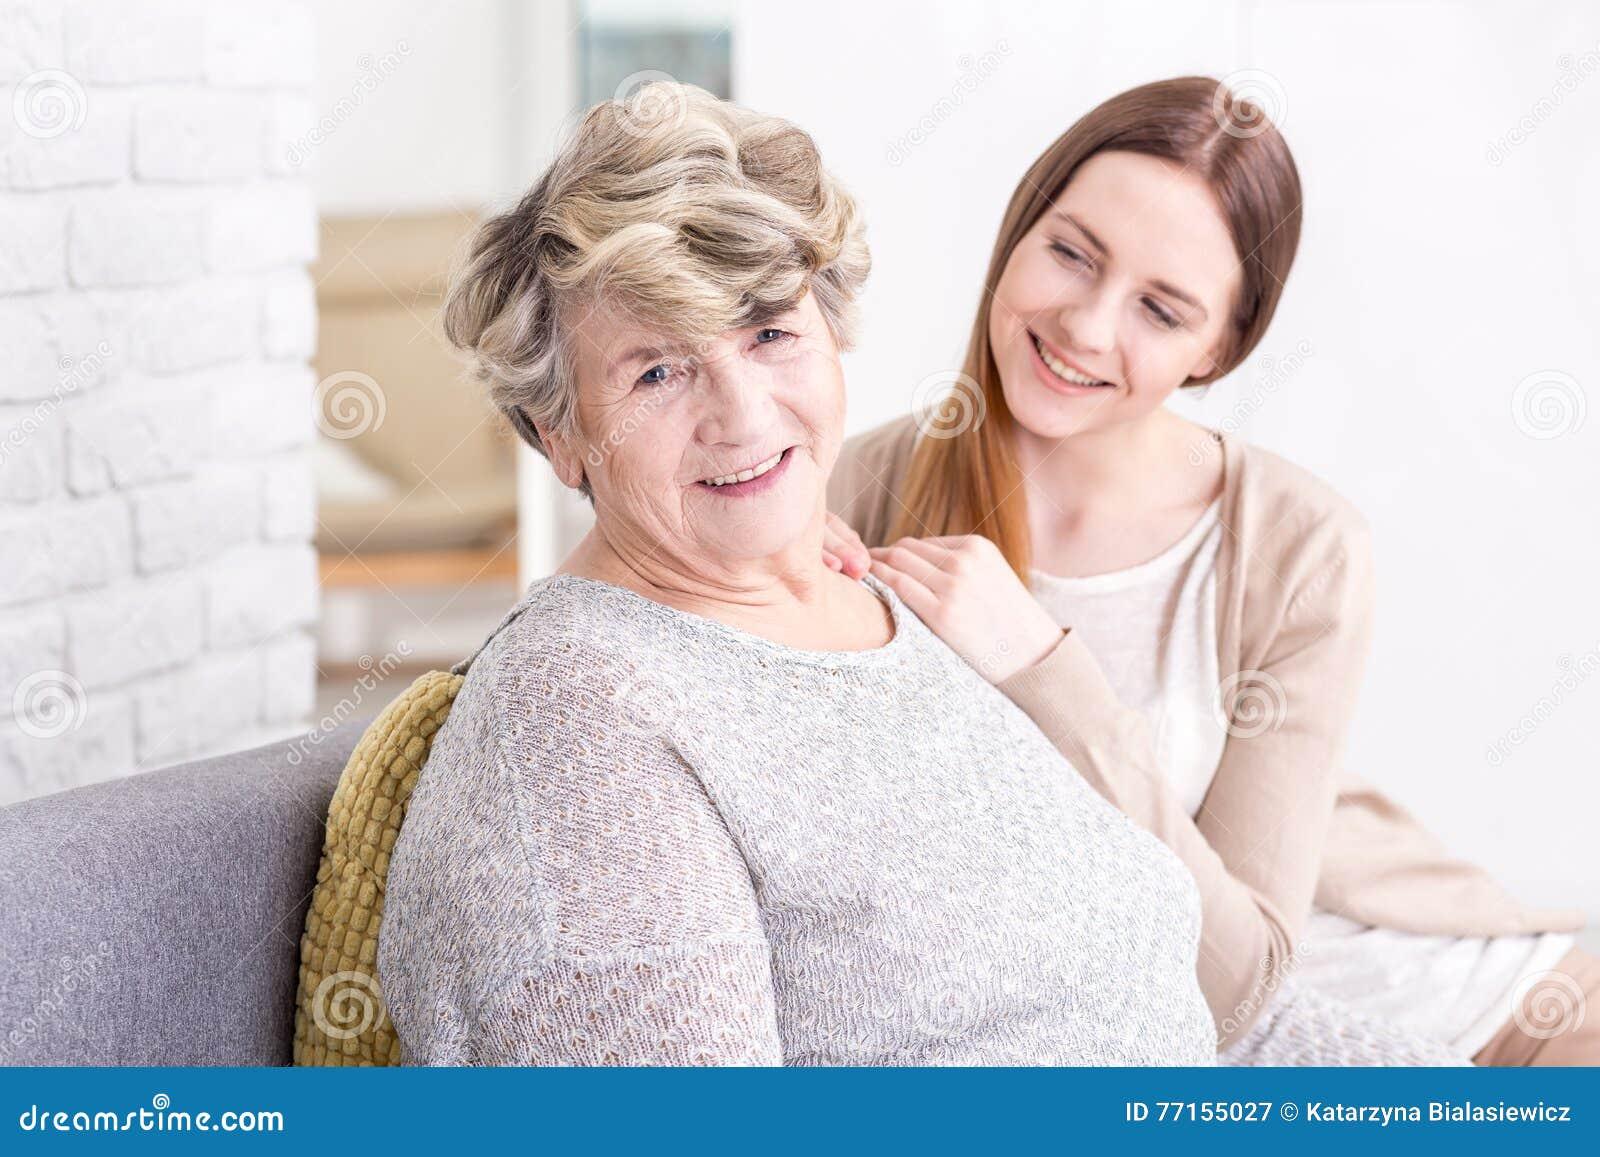 Moments heureux aimants ainsi que la grand-maman